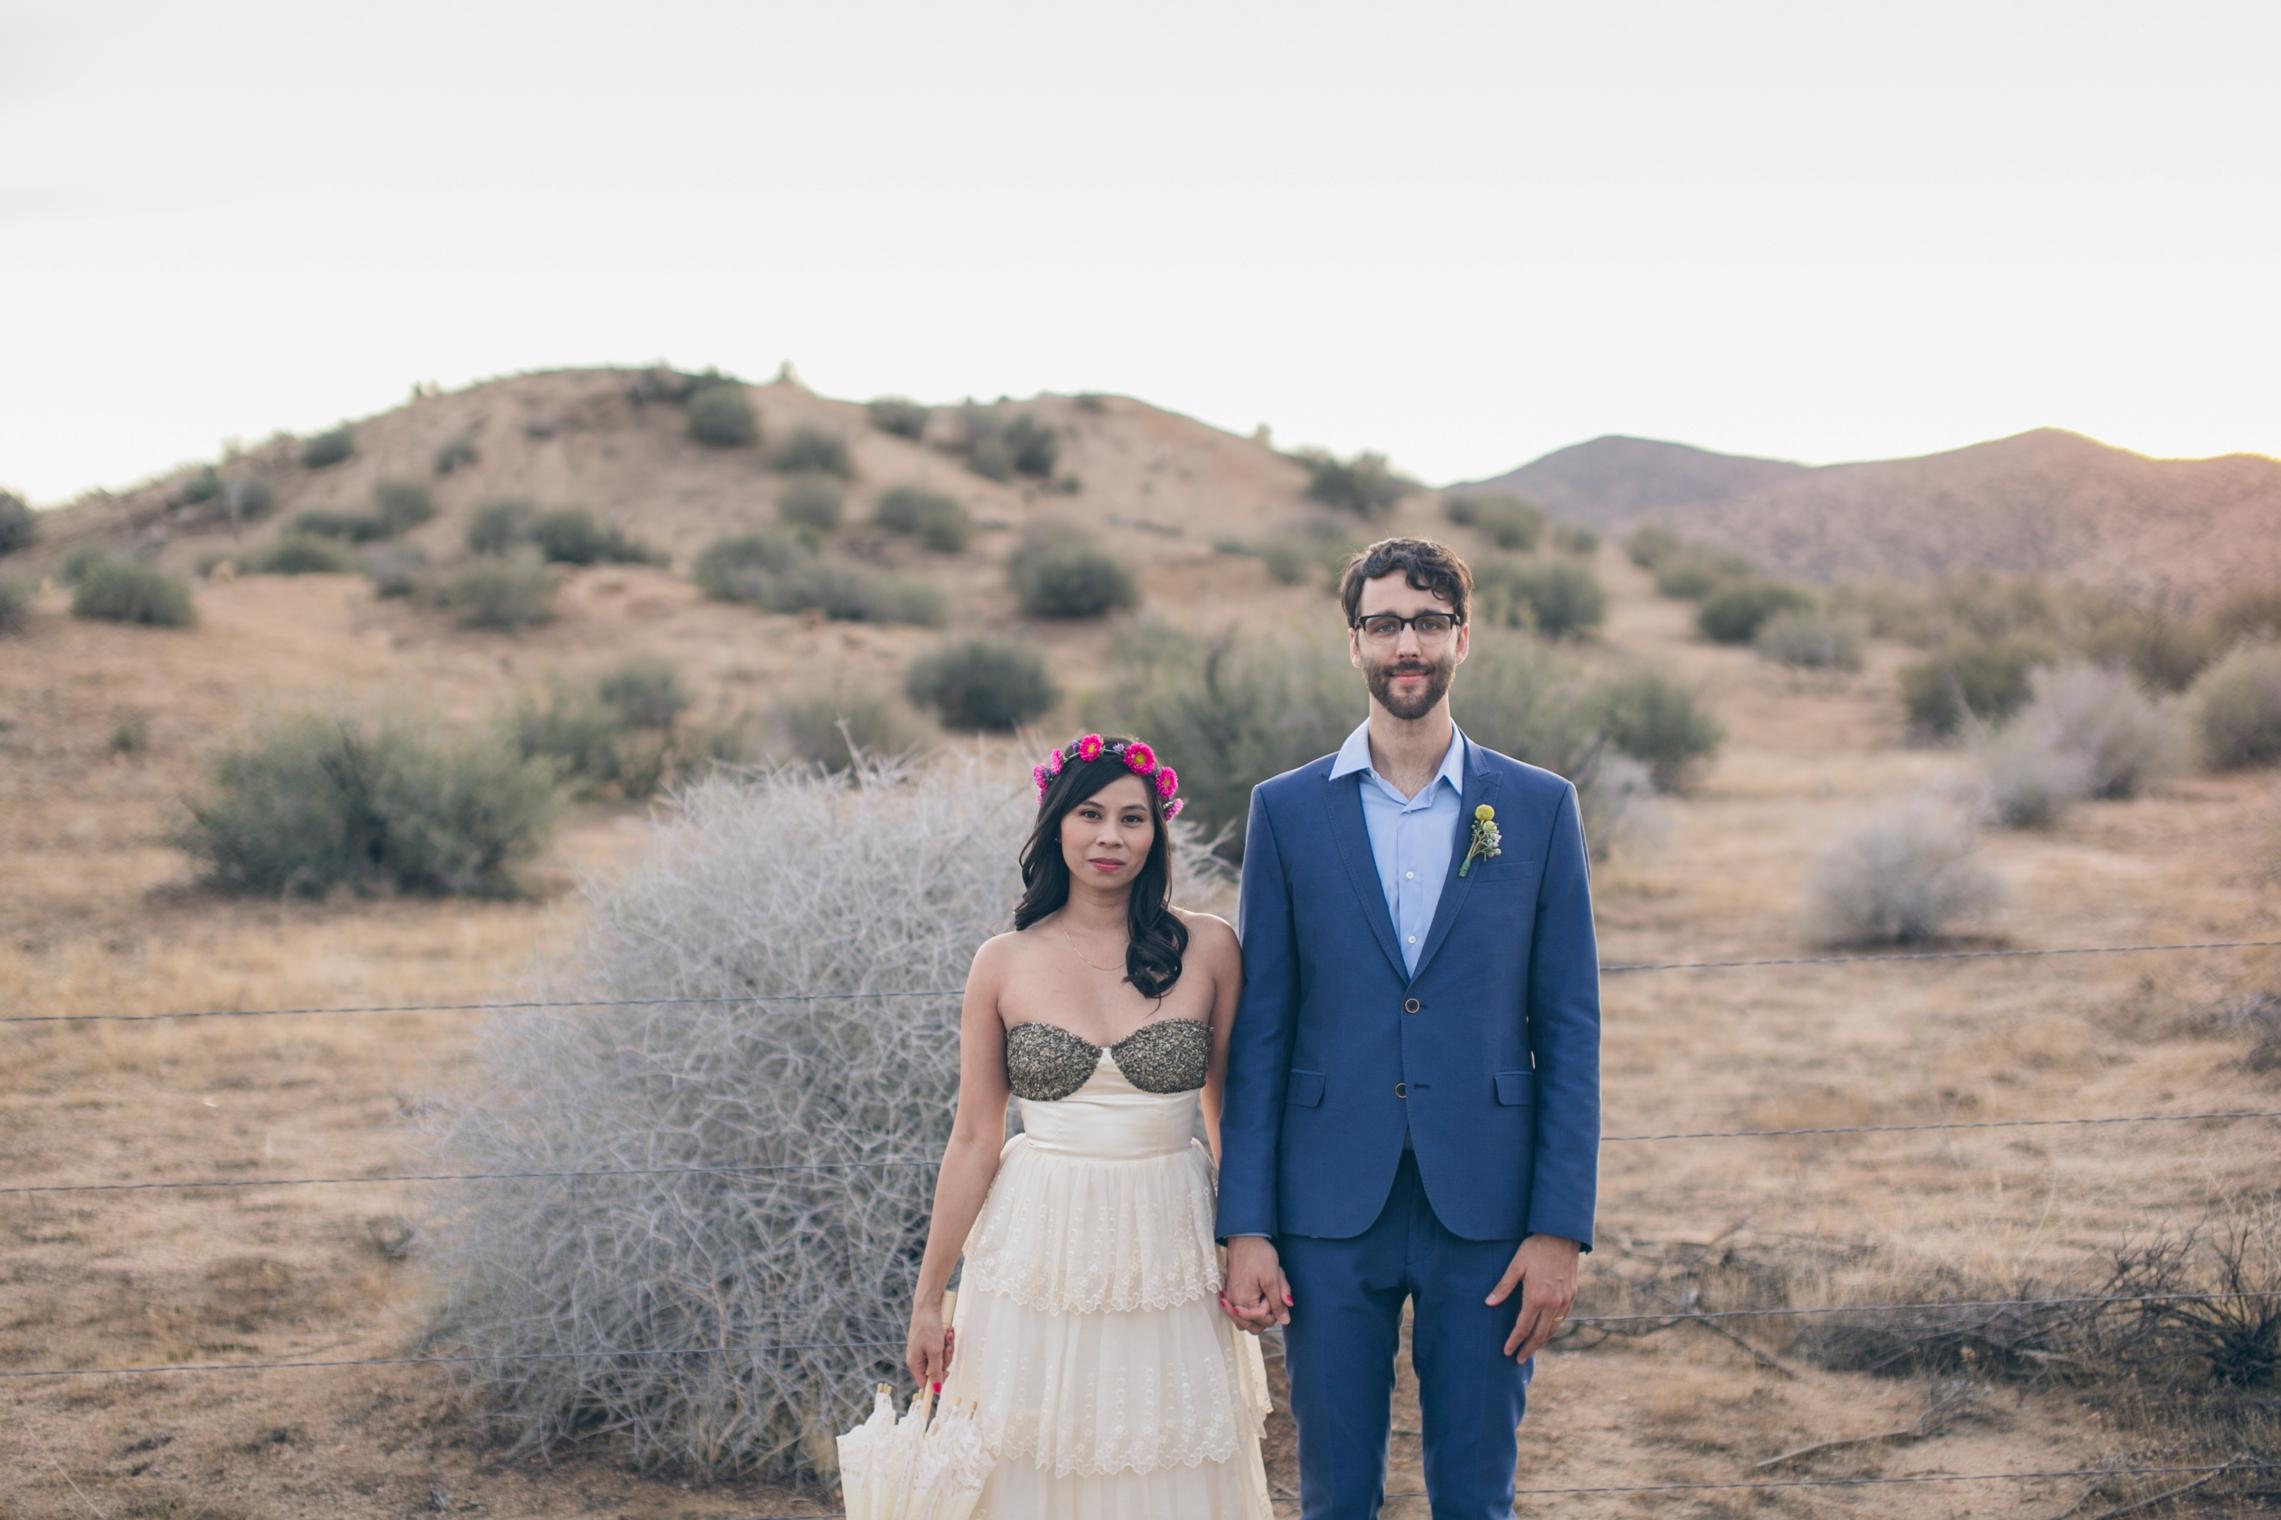 Joshua-Tree-Wedding-Rimrock-Ranch_0011.jpg